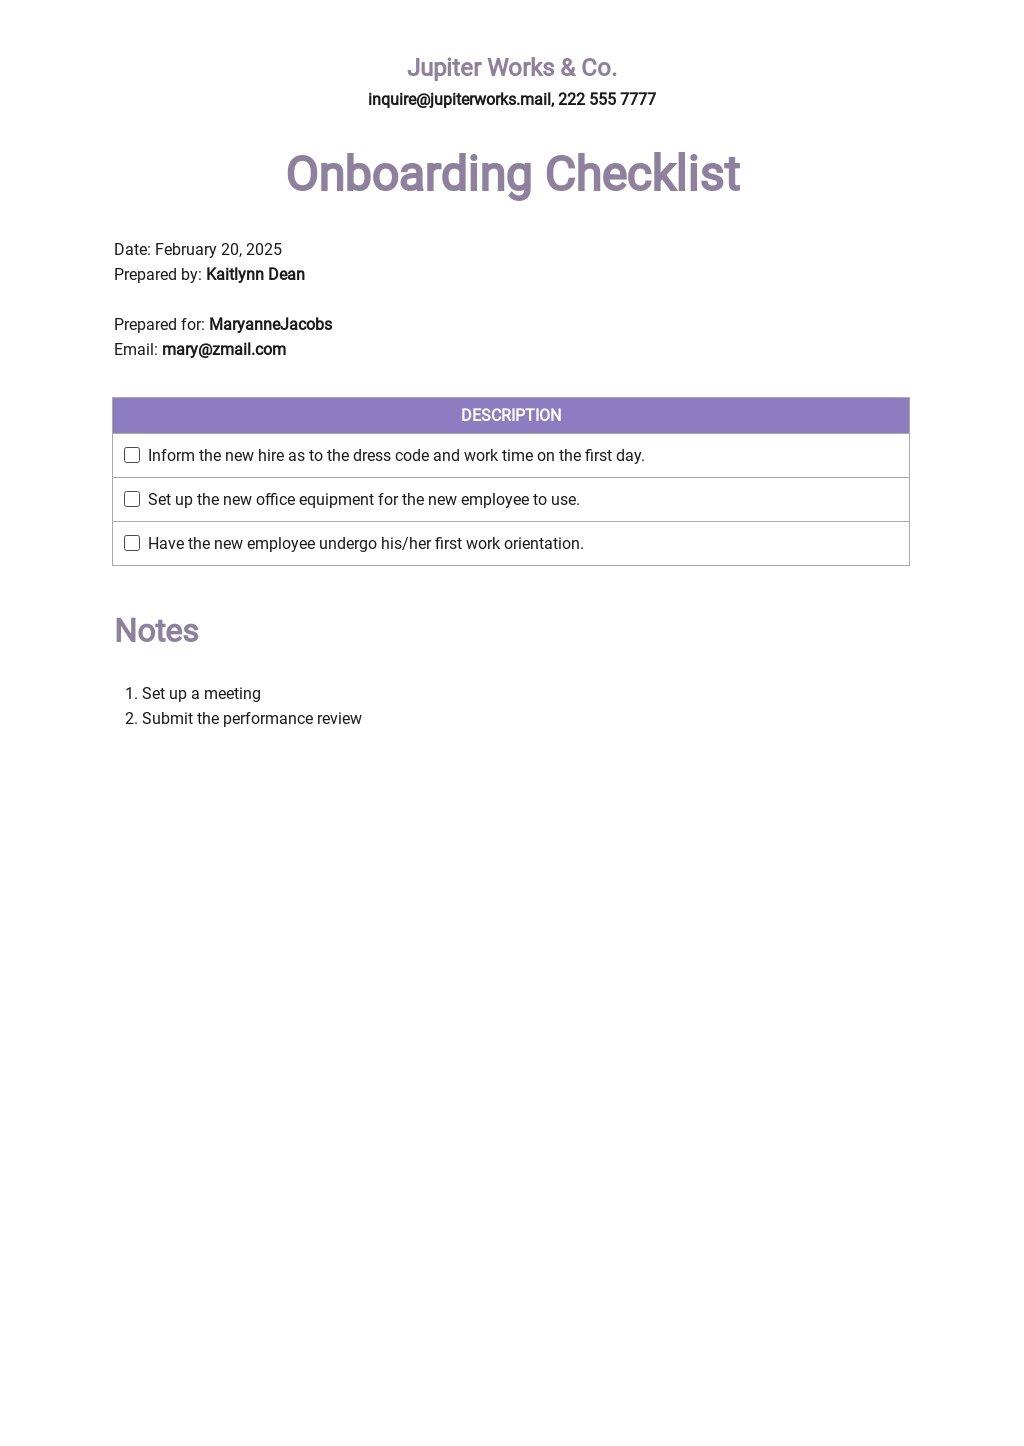 Onboarding Checklist Template.jpe